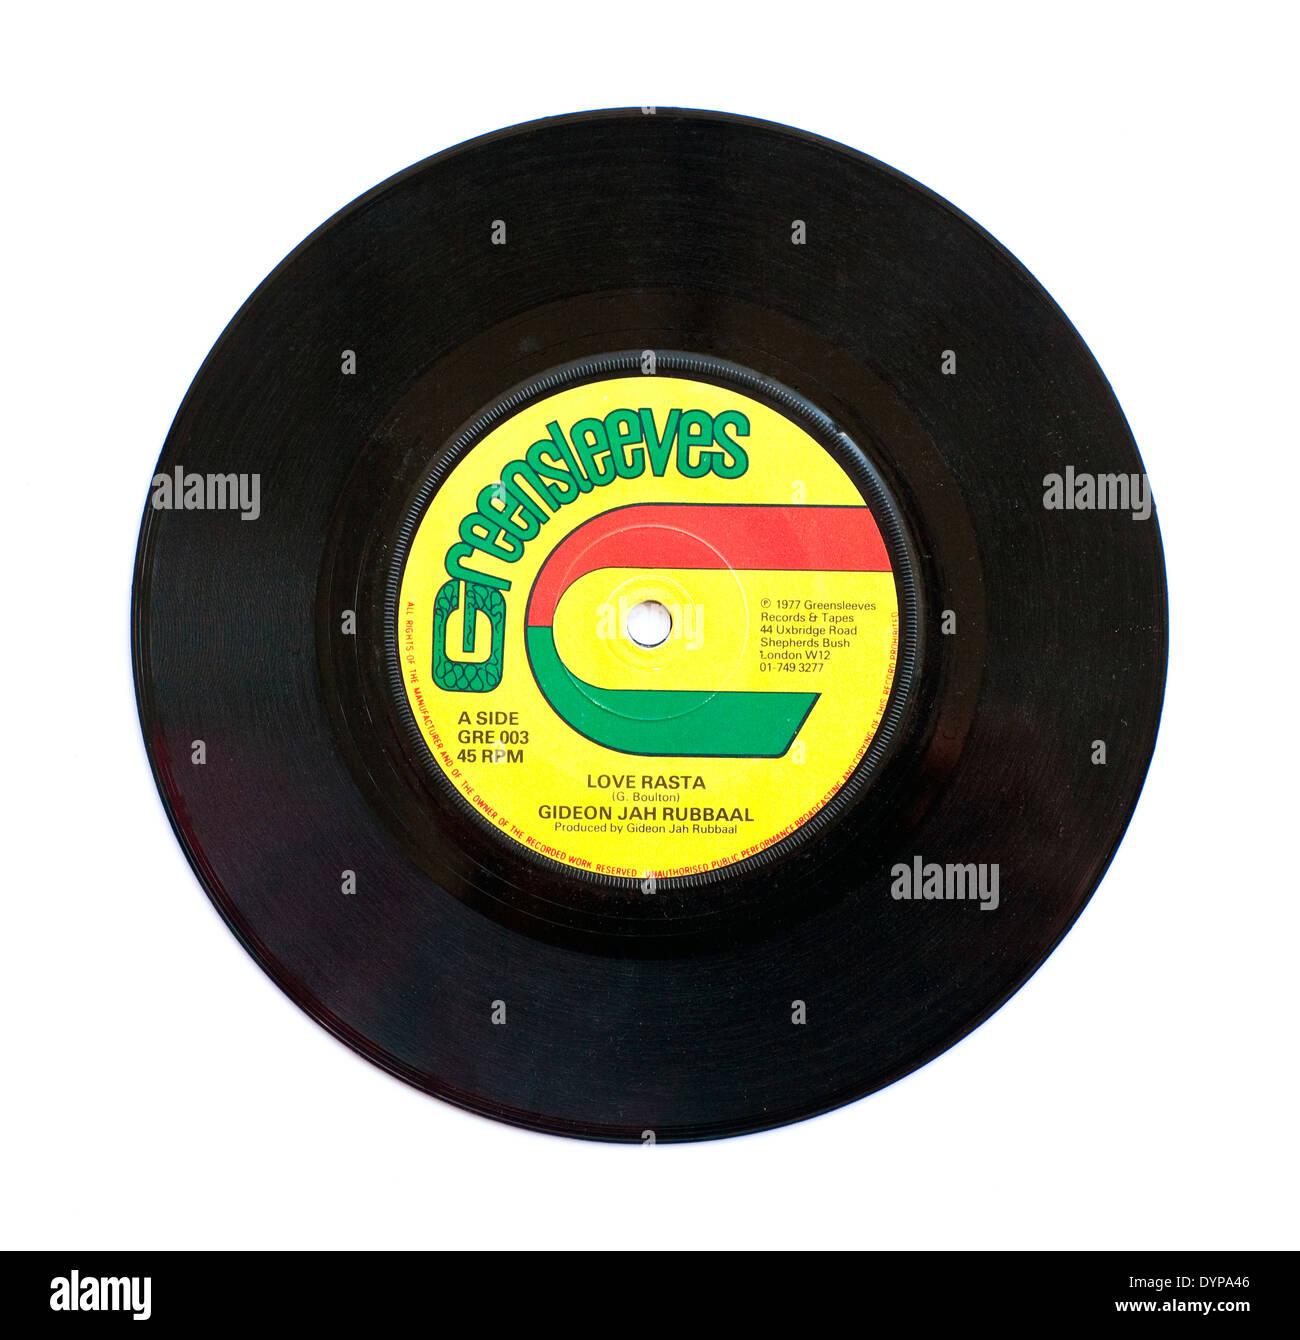 Gideon Jah Rubbal, Love Rasta, Greensleeves Records 1977 - Stock Image